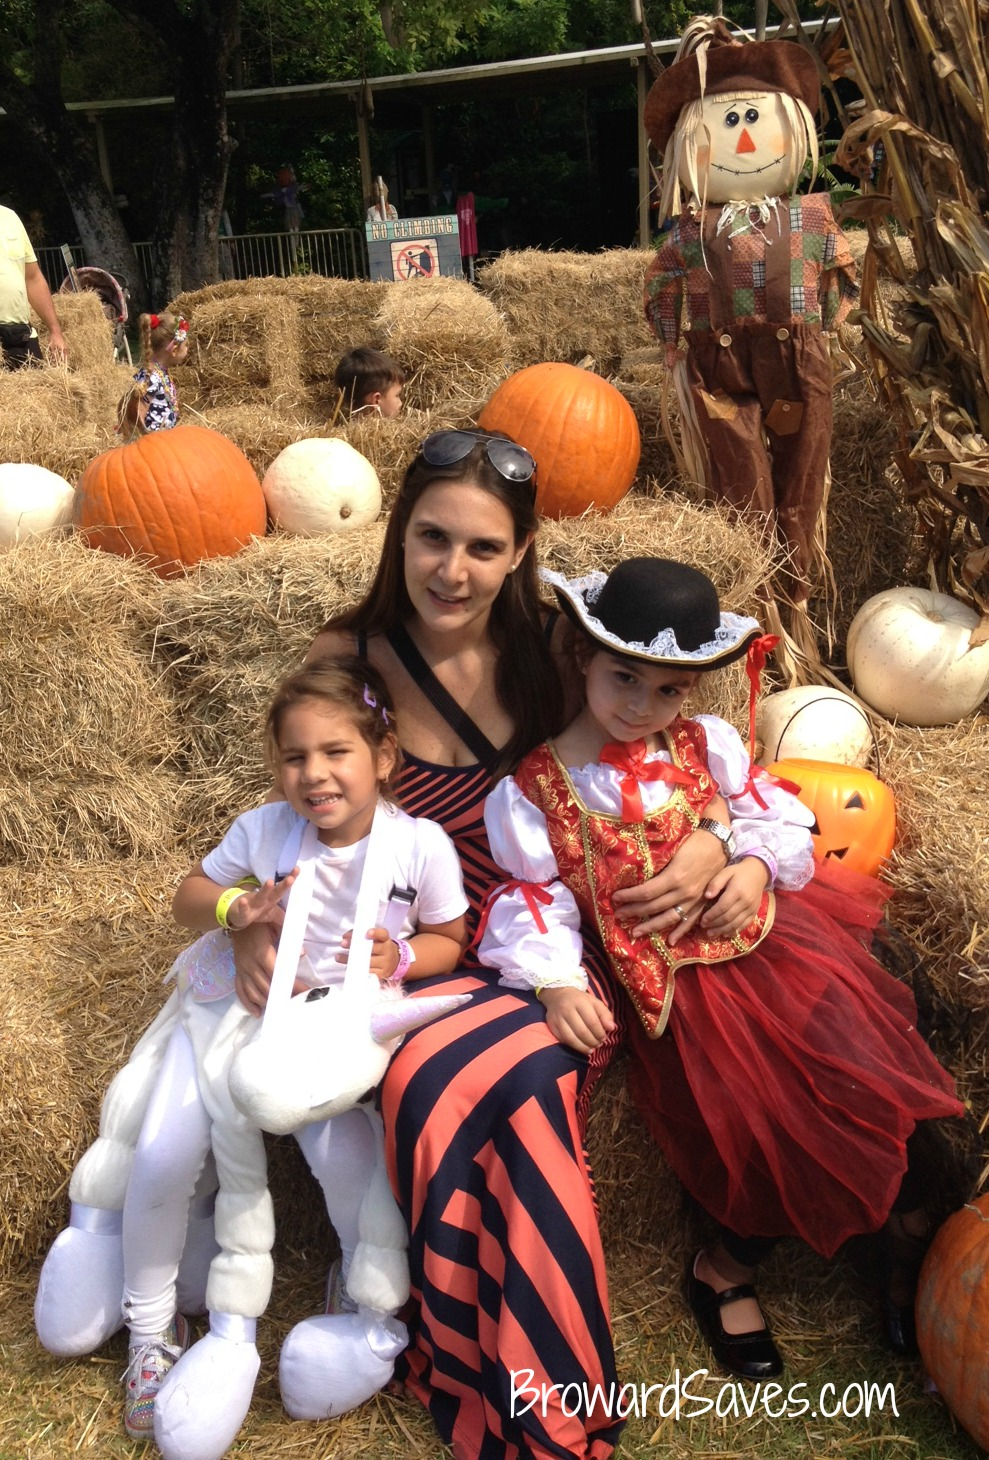 jungle island spooktacular event broward saves 6 - Halloween Events In Broward